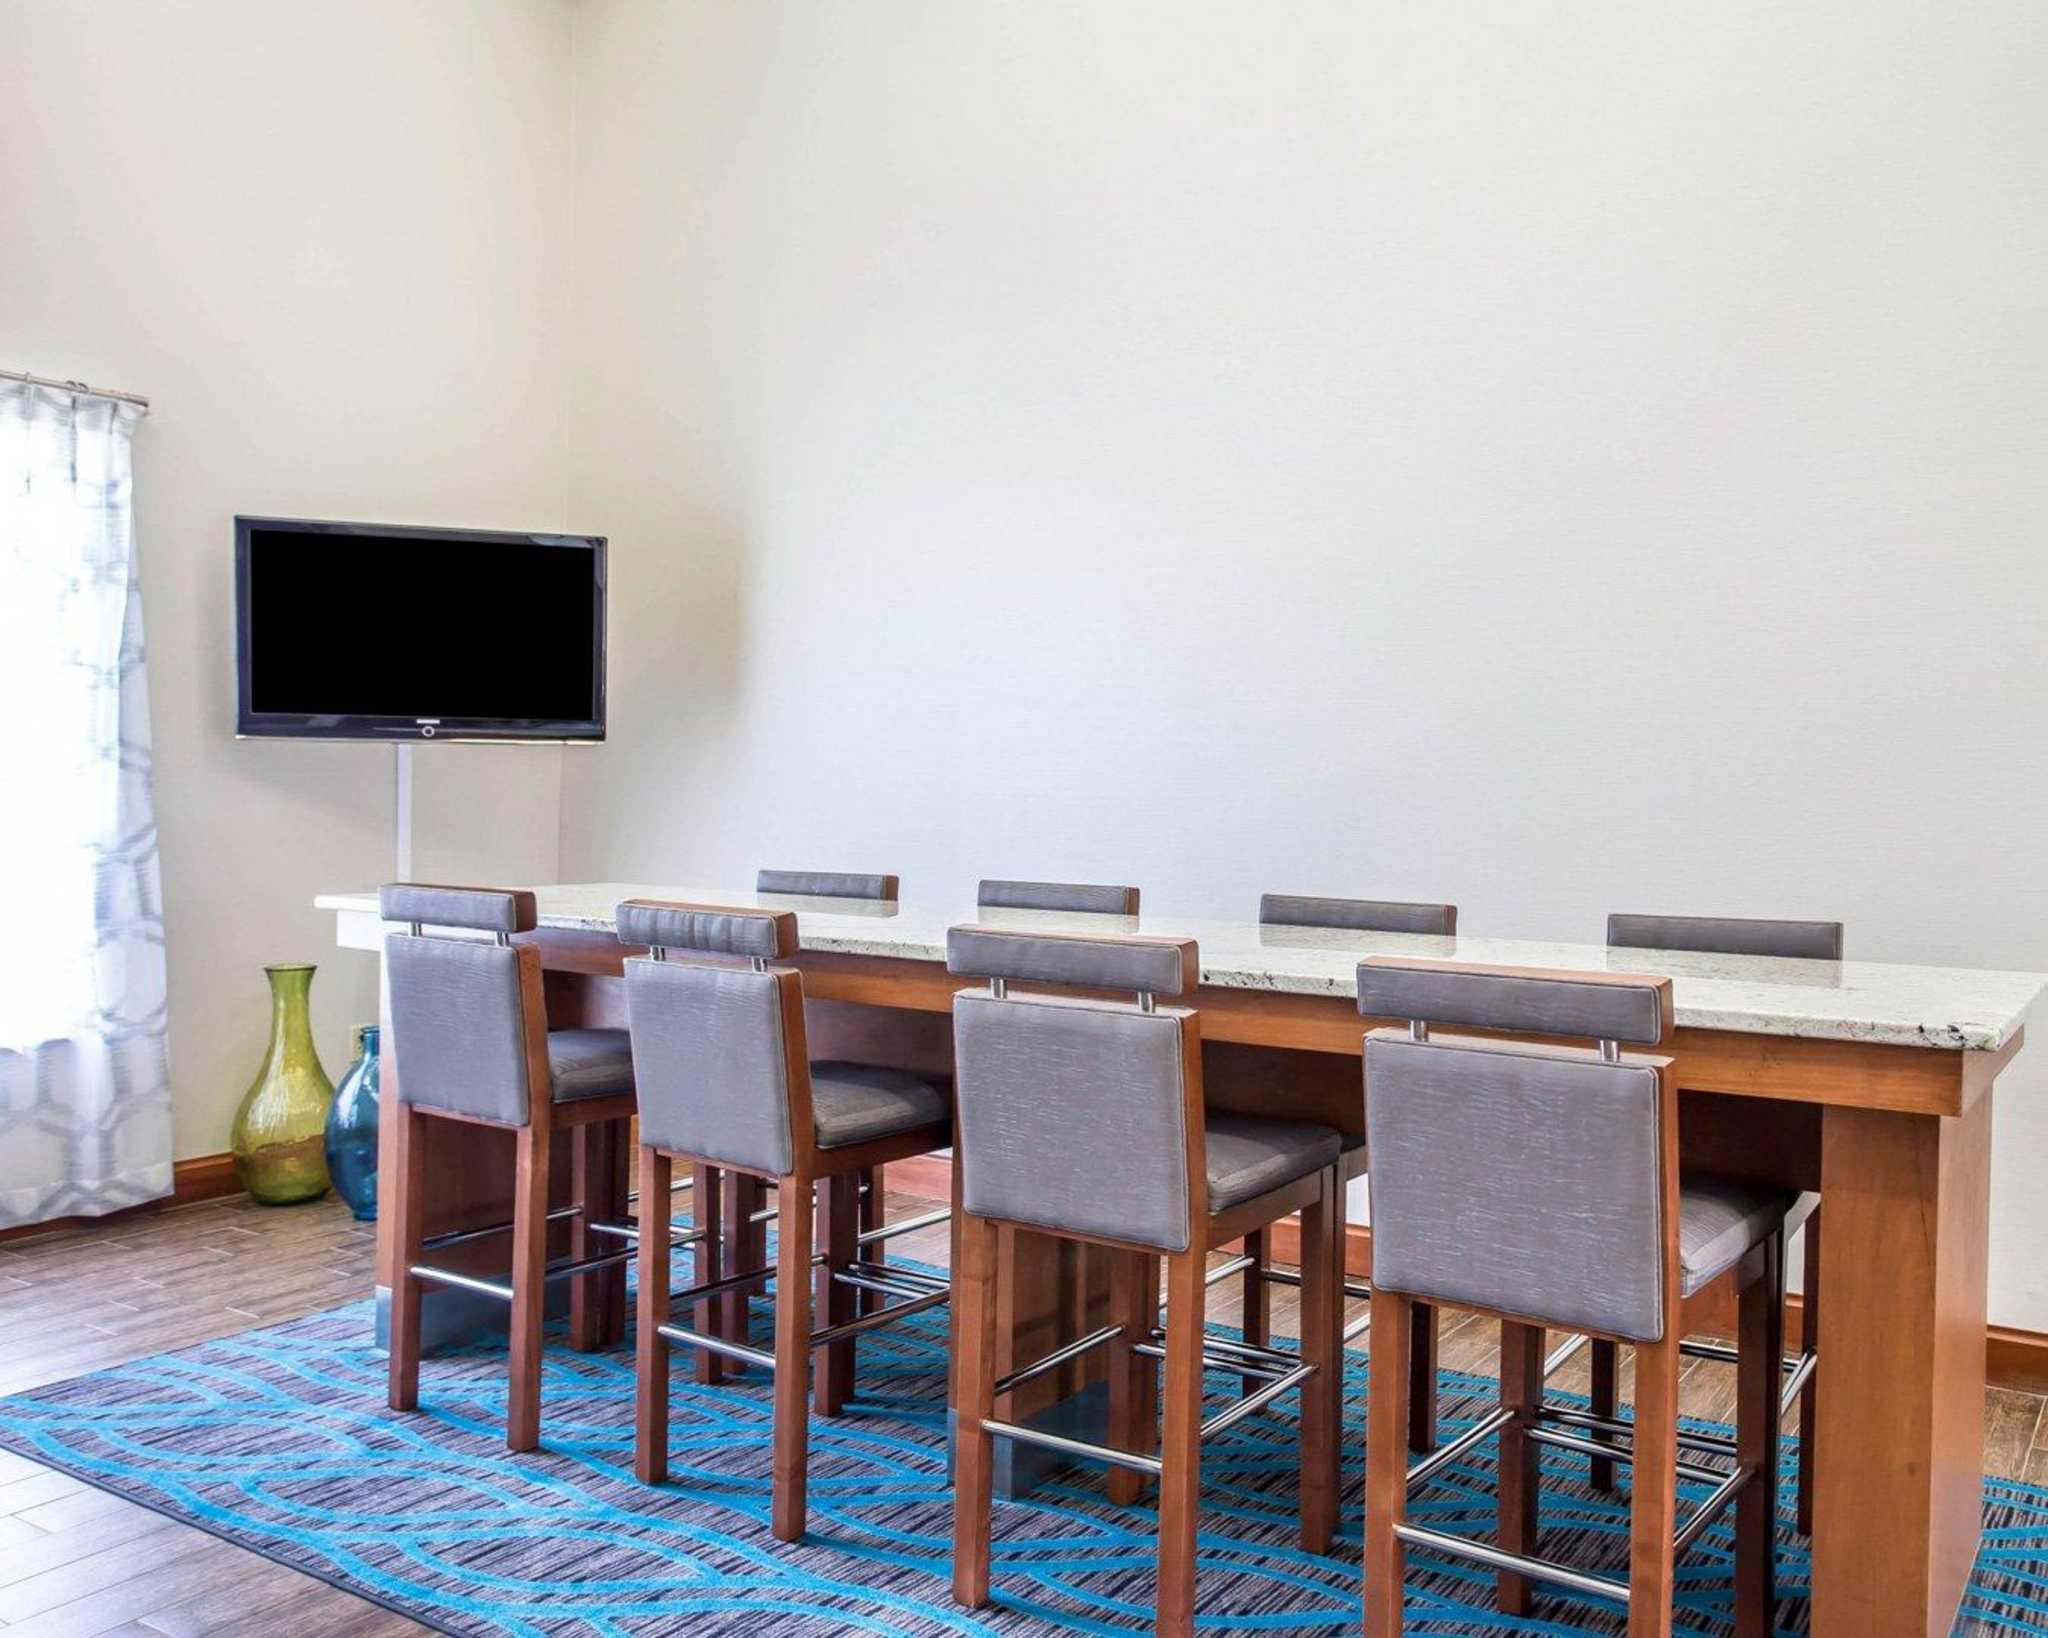 Comfort Inn & Suites - Walterboro, SC - Business Information